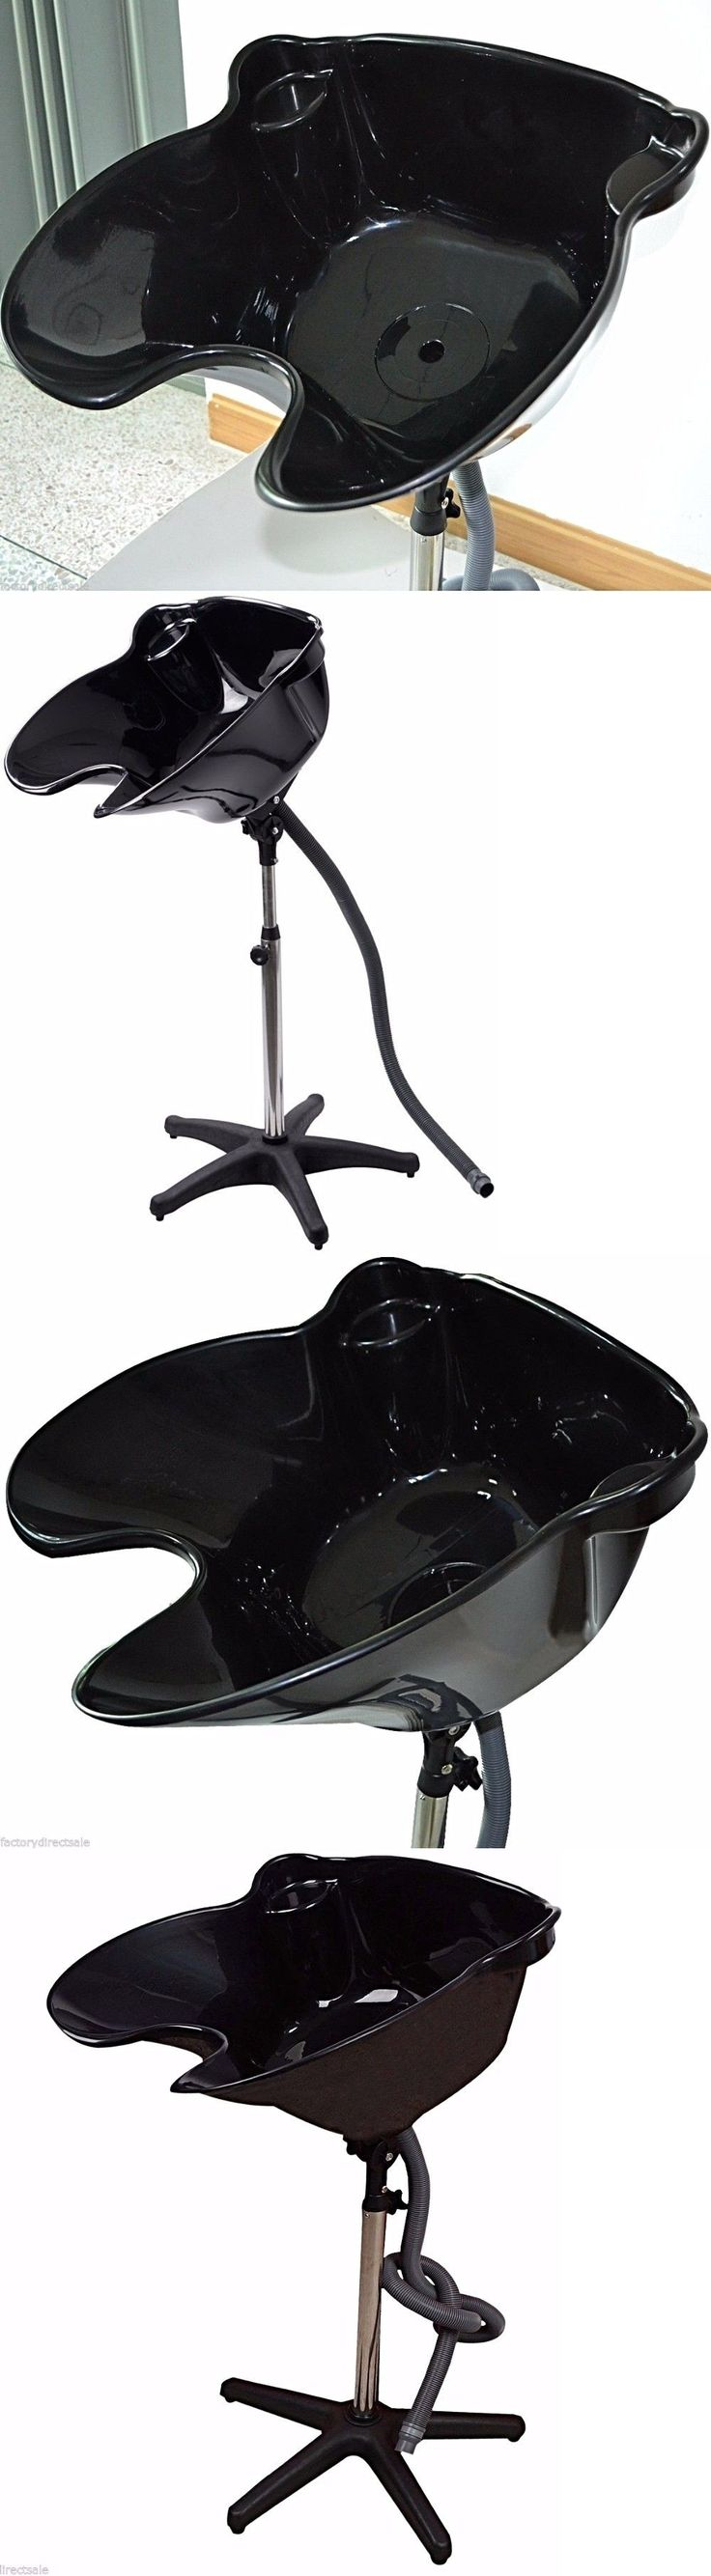 Laundry sink ebay - Backwash Units And Shampoo Bowls Portable Shampoo Sink Rinse Basin Hair Stylist Hairdresser Wash Bowl